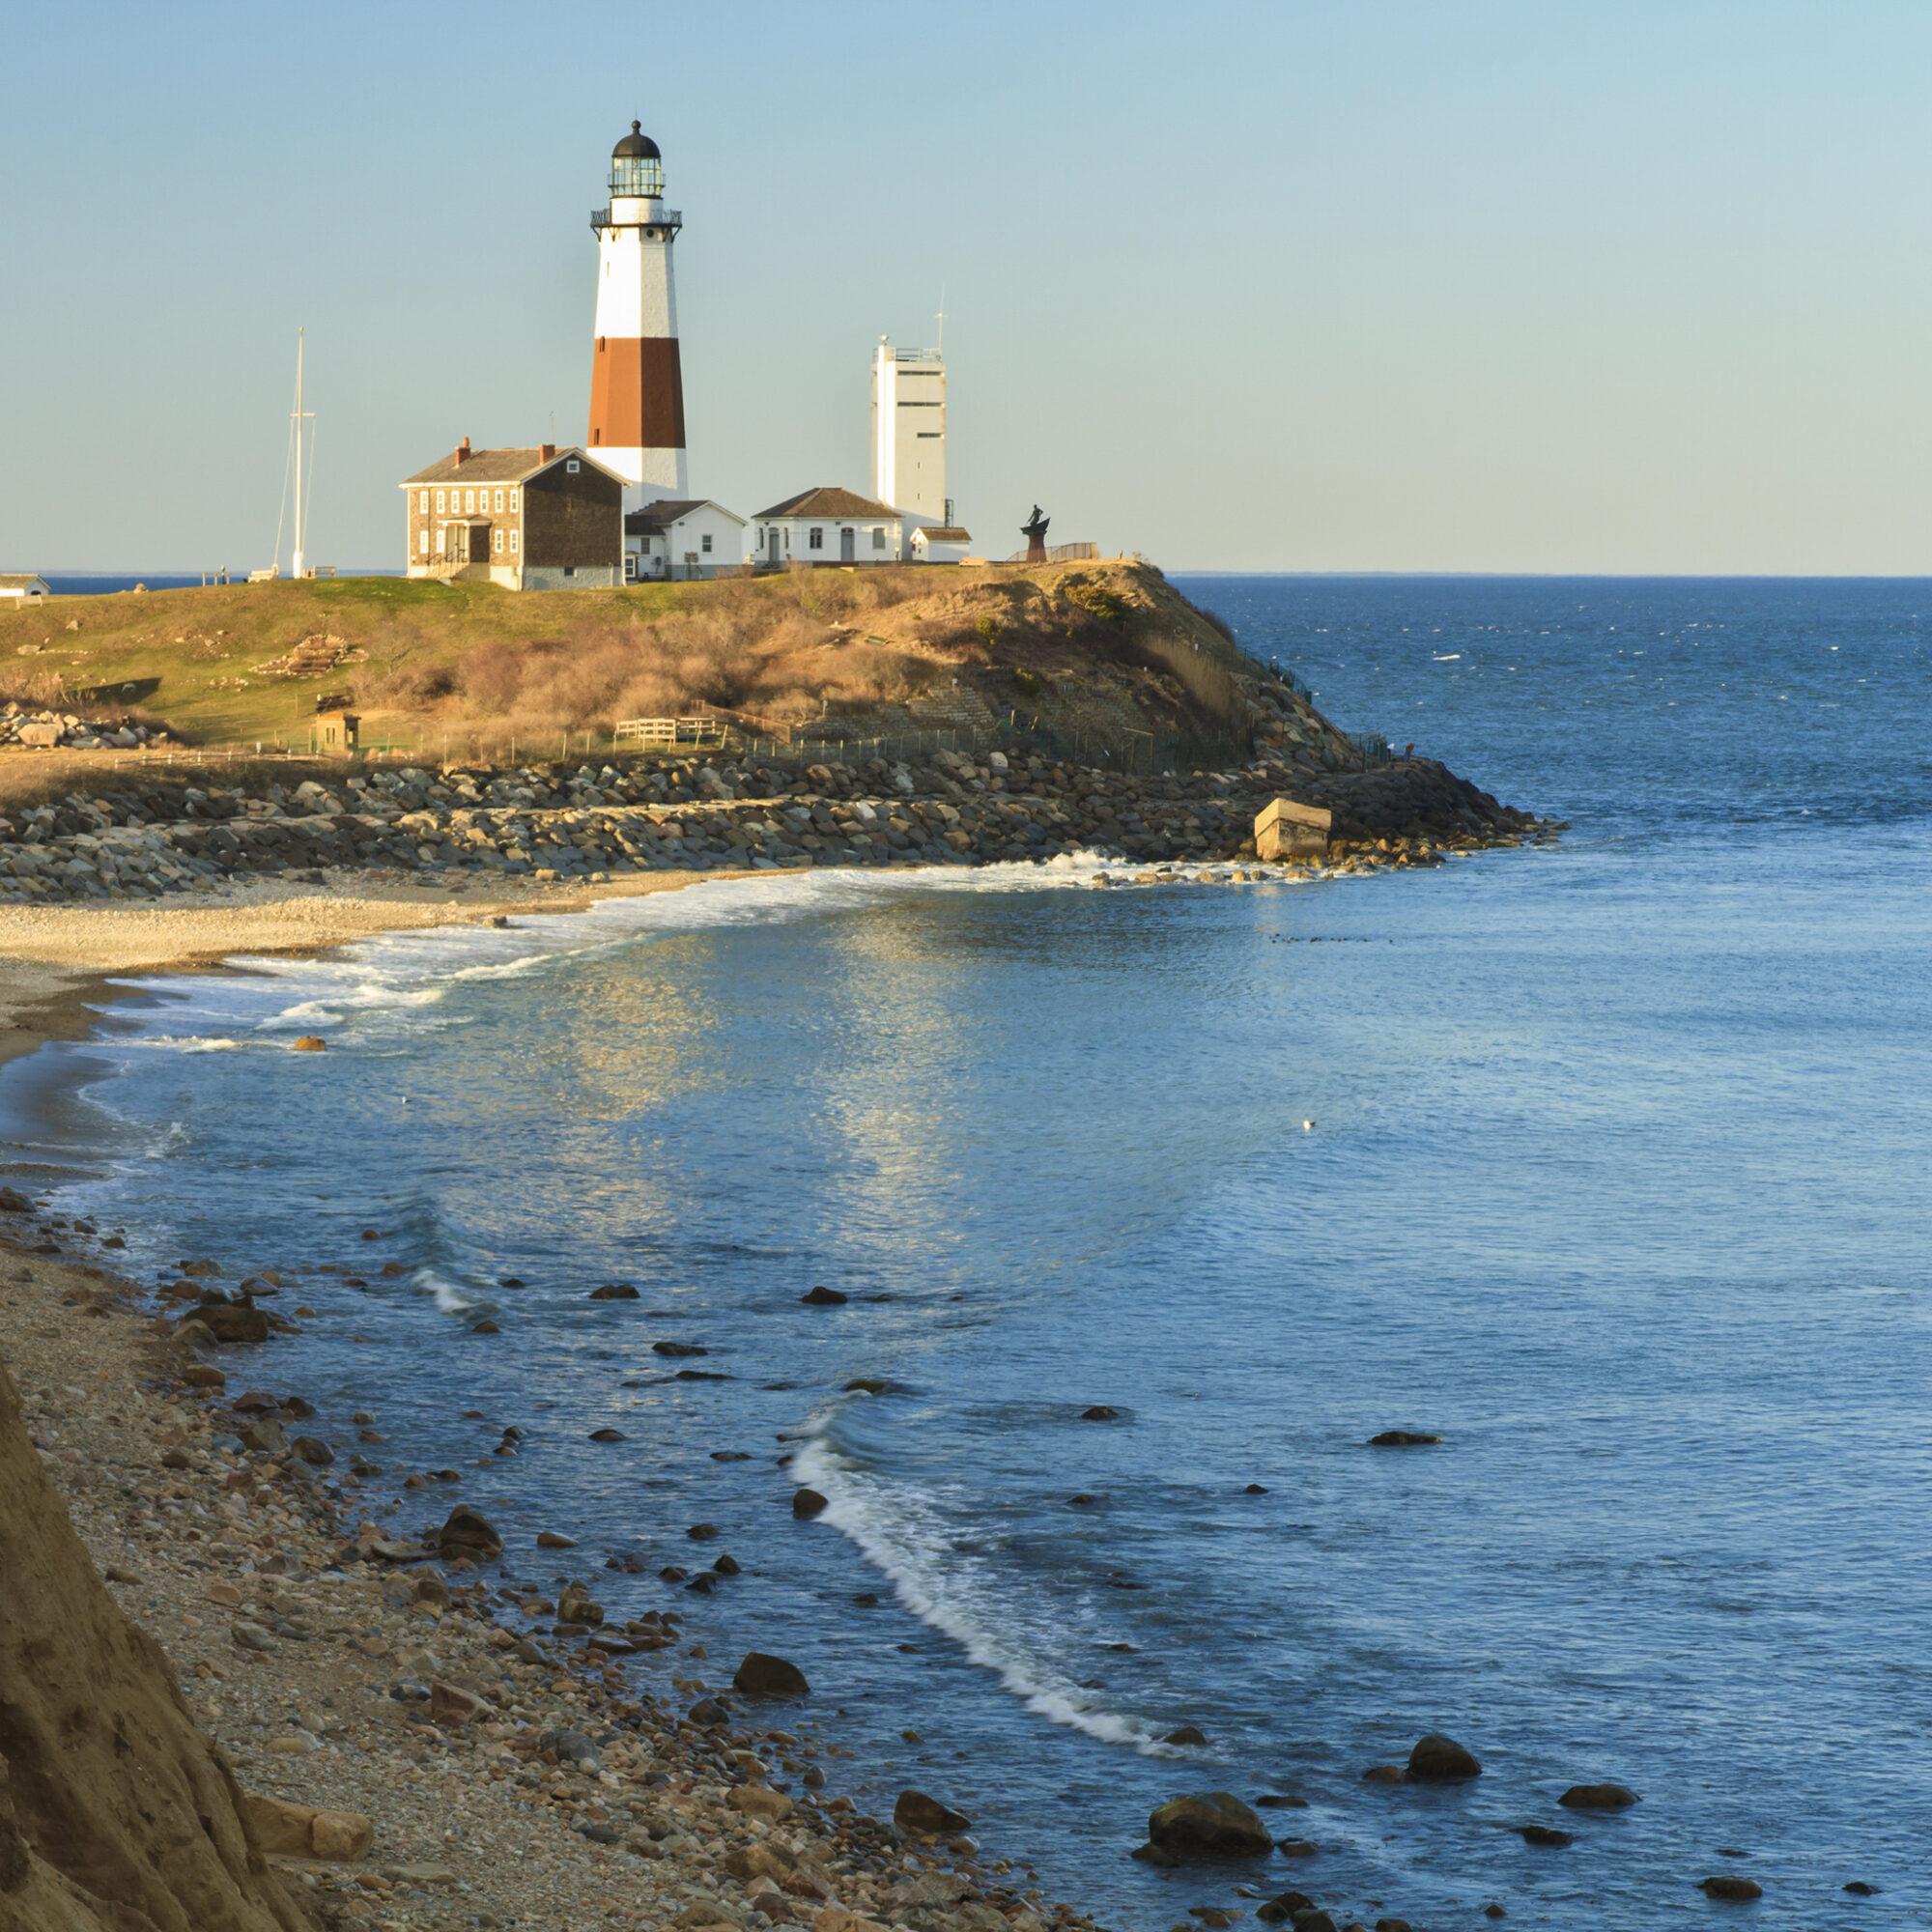 The Montauk Lighthouse in New York.